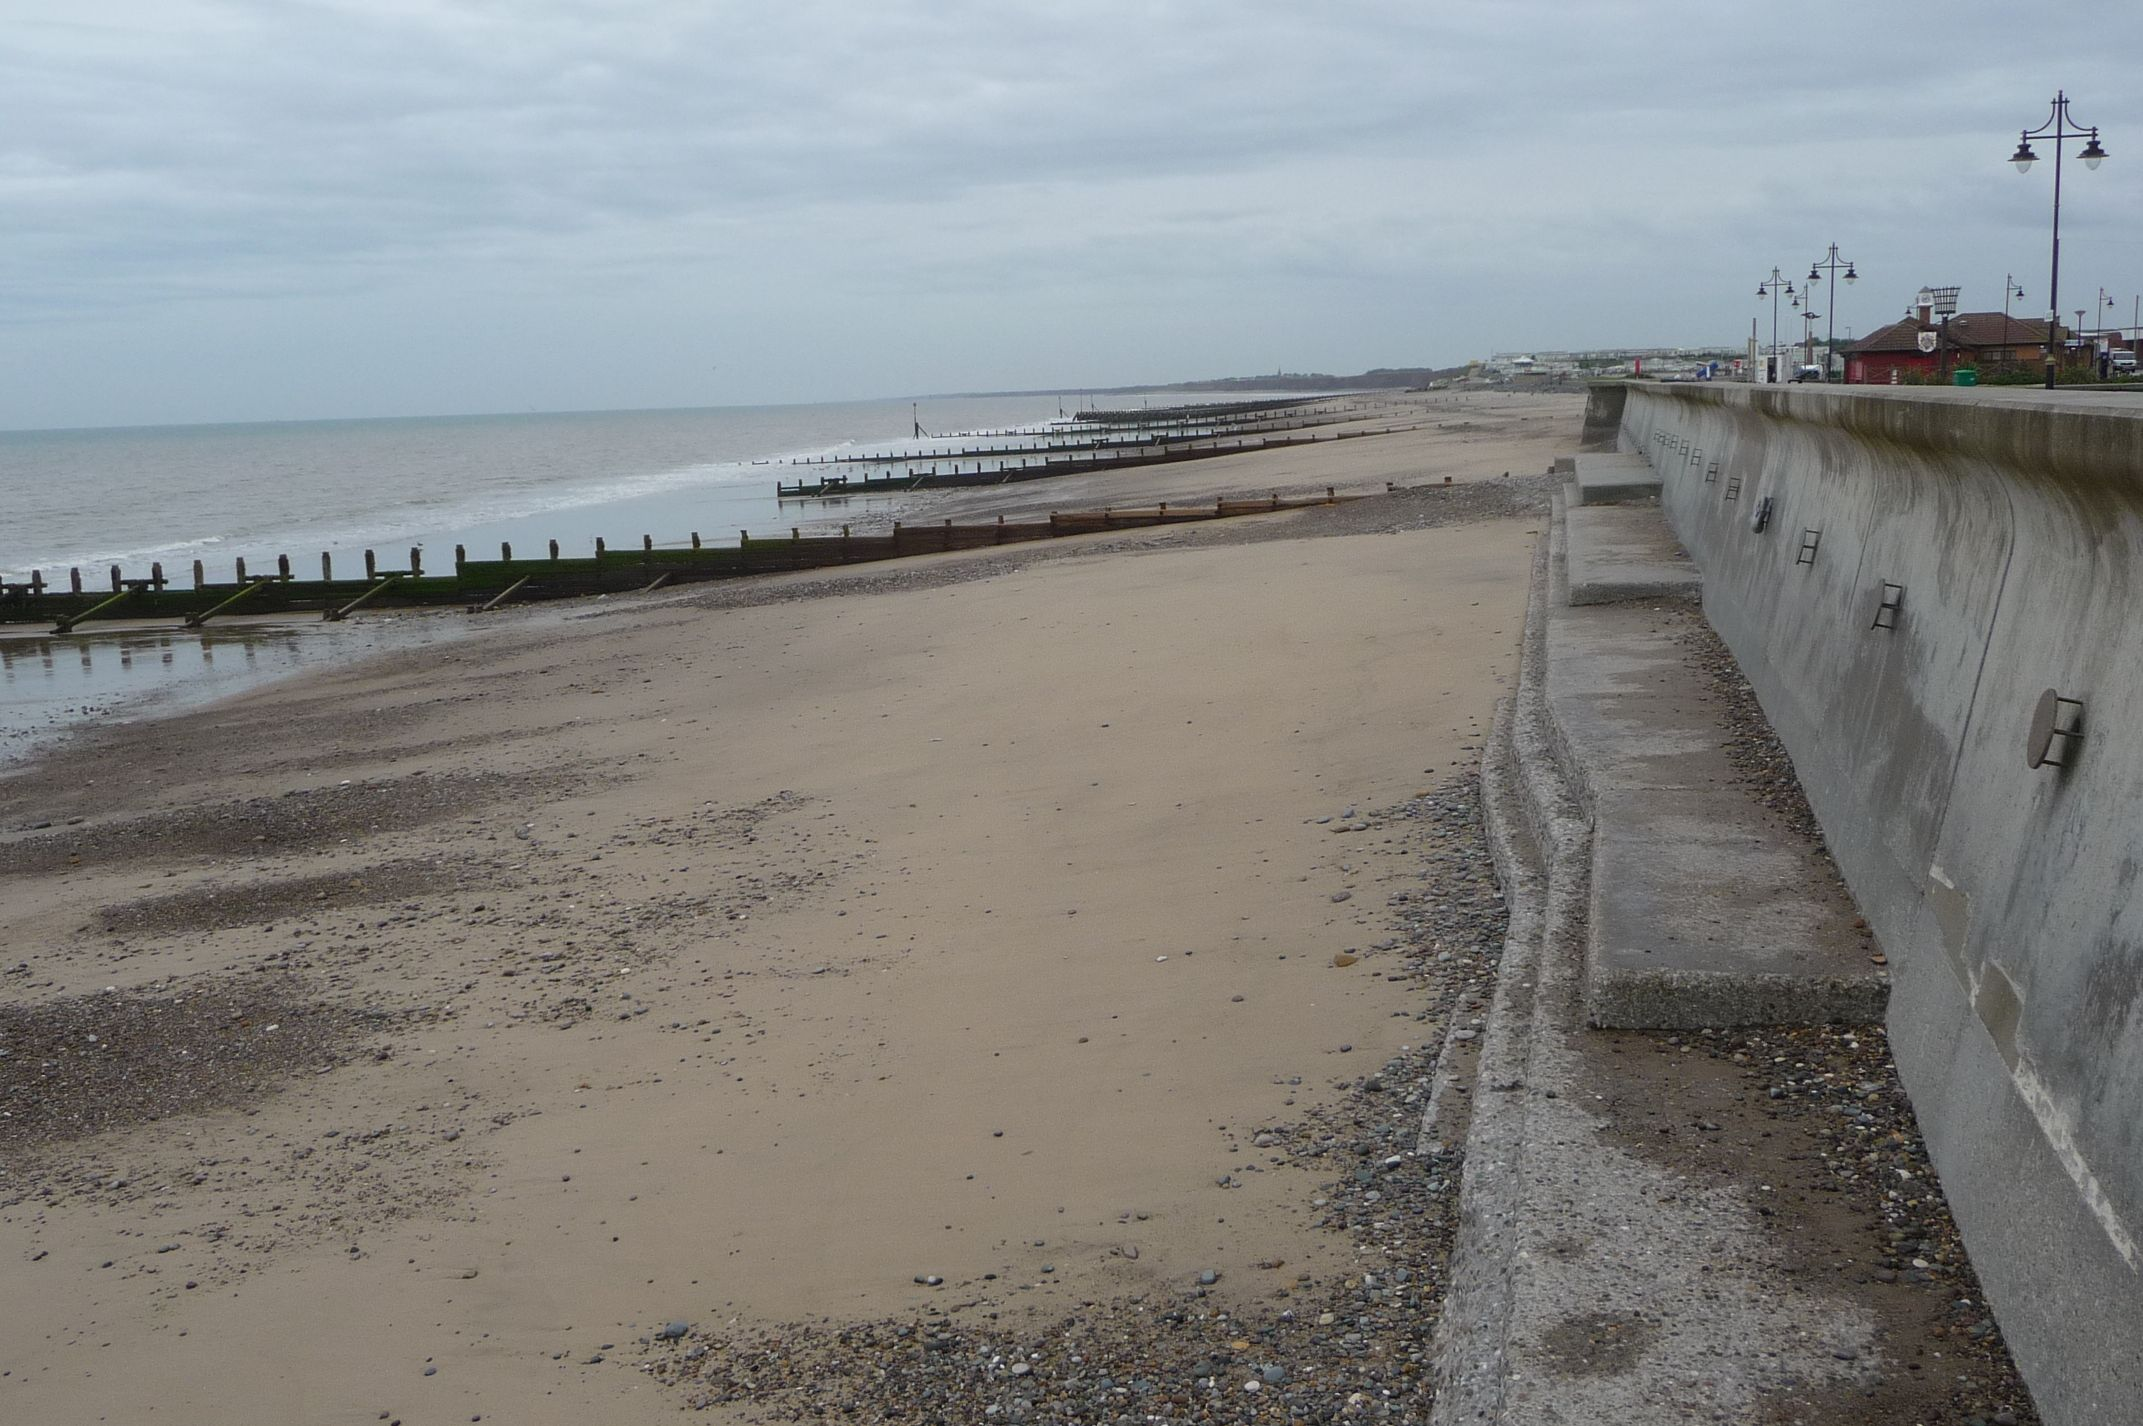 Hornsea Beach. | The Yorkshire Coast - North to South ... Hornsea